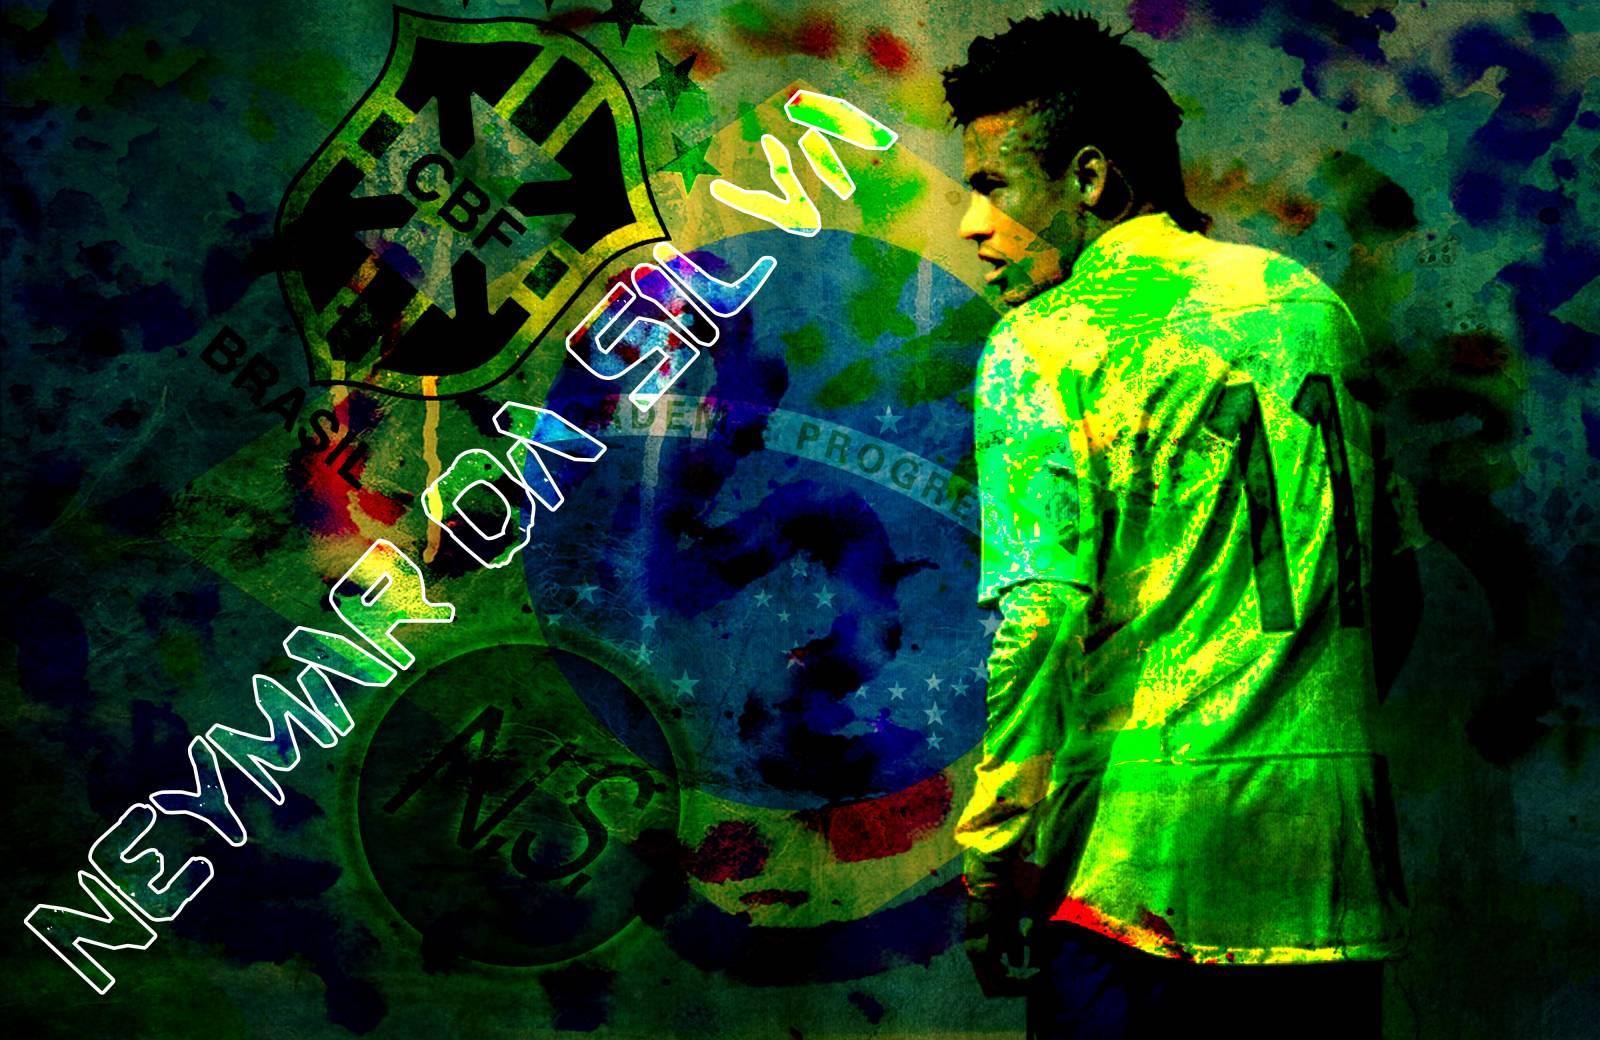 http://2.bp.blogspot.com/-5vKg0mfA0Bw/Tv32ksPhh-I/AAAAAAAAB2o/o6VZ9BP557Y/s1600/wallpaper-neymar-3.jpg